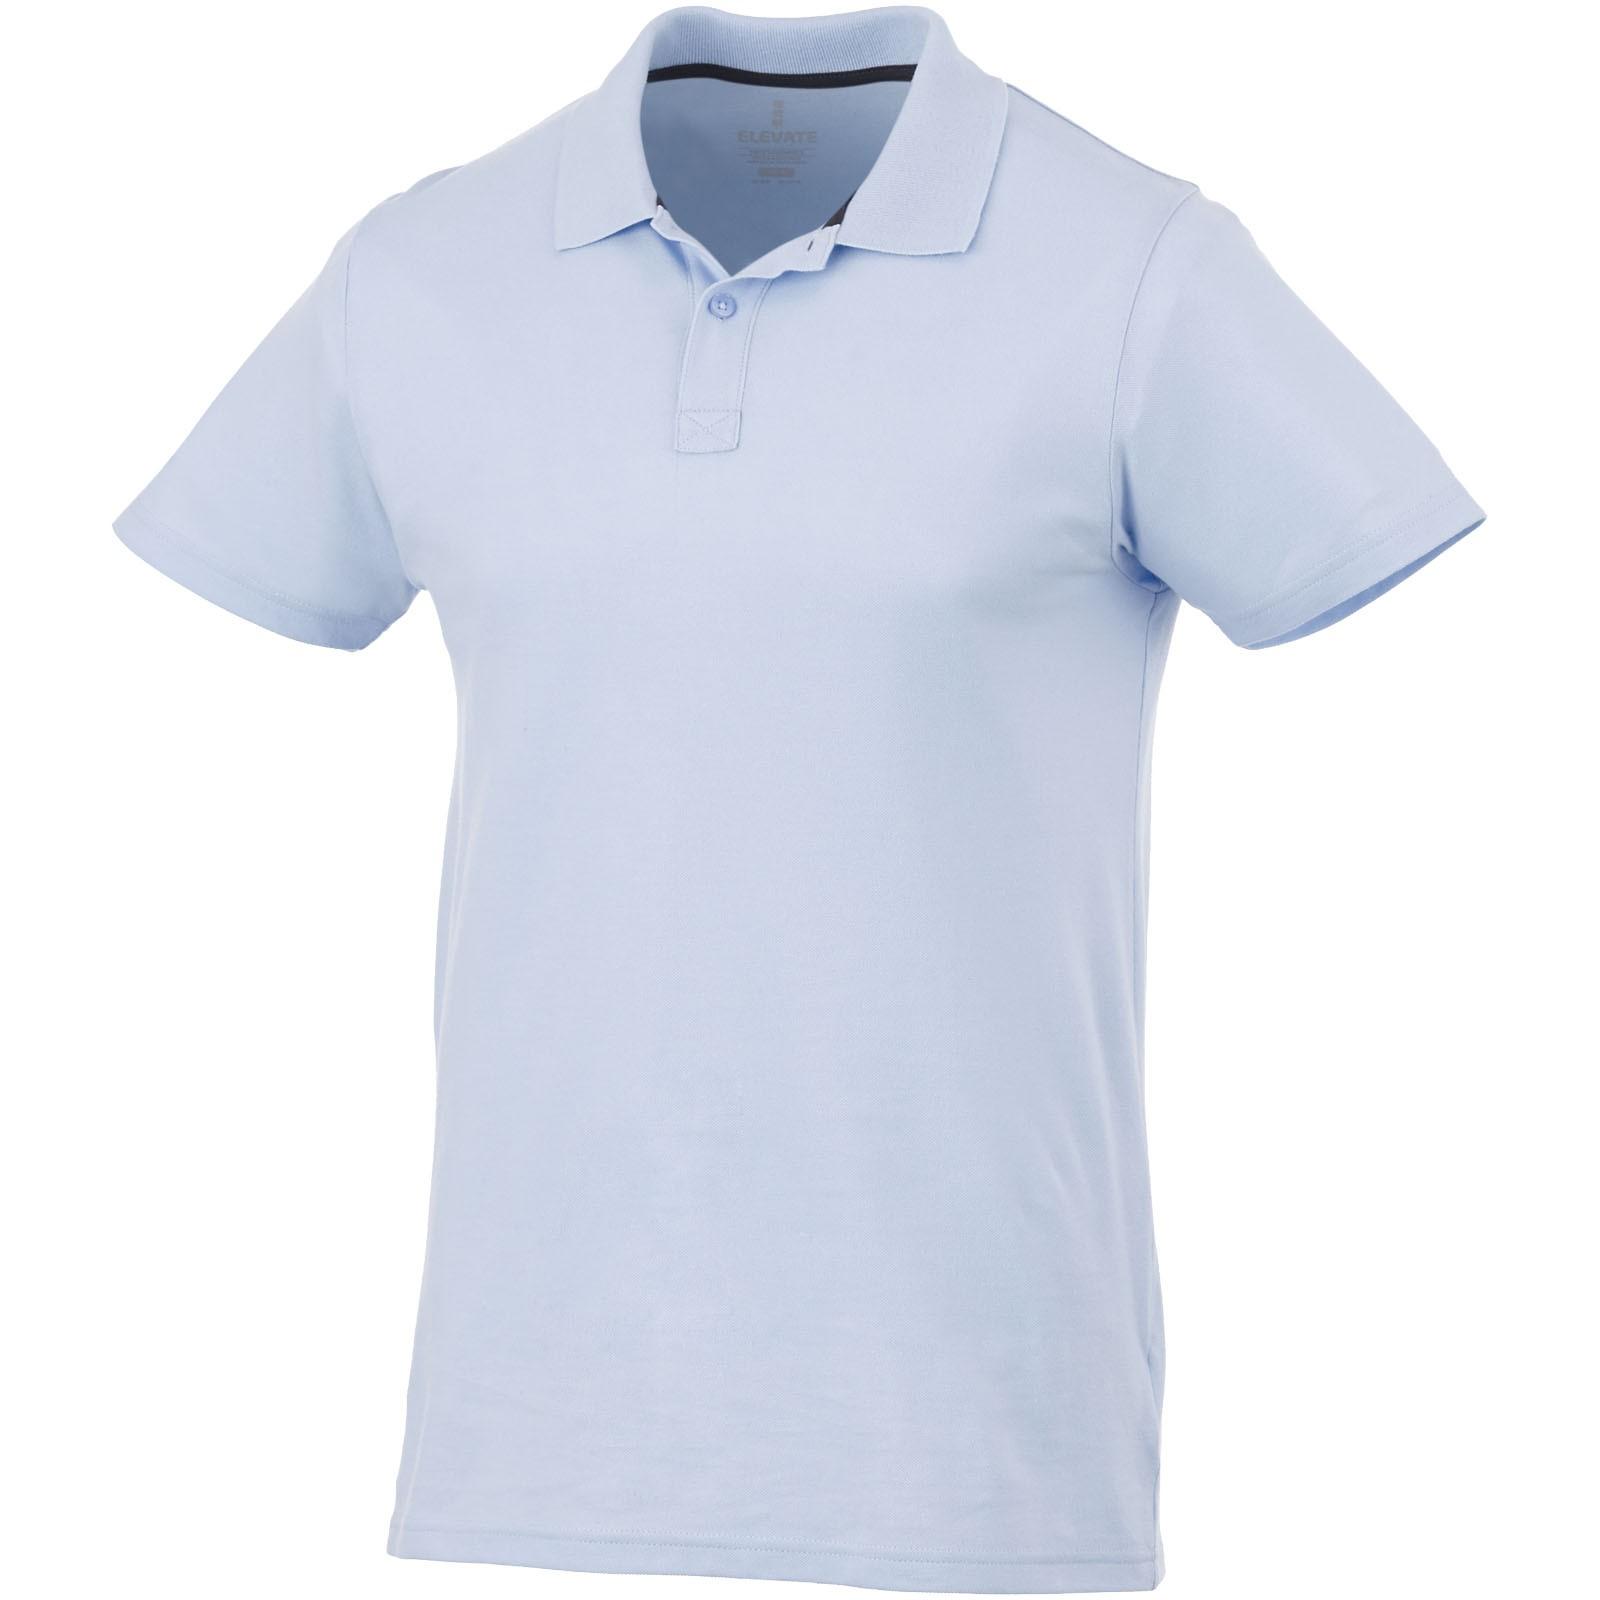 Primus short sleeve men's polo - Light blue / L